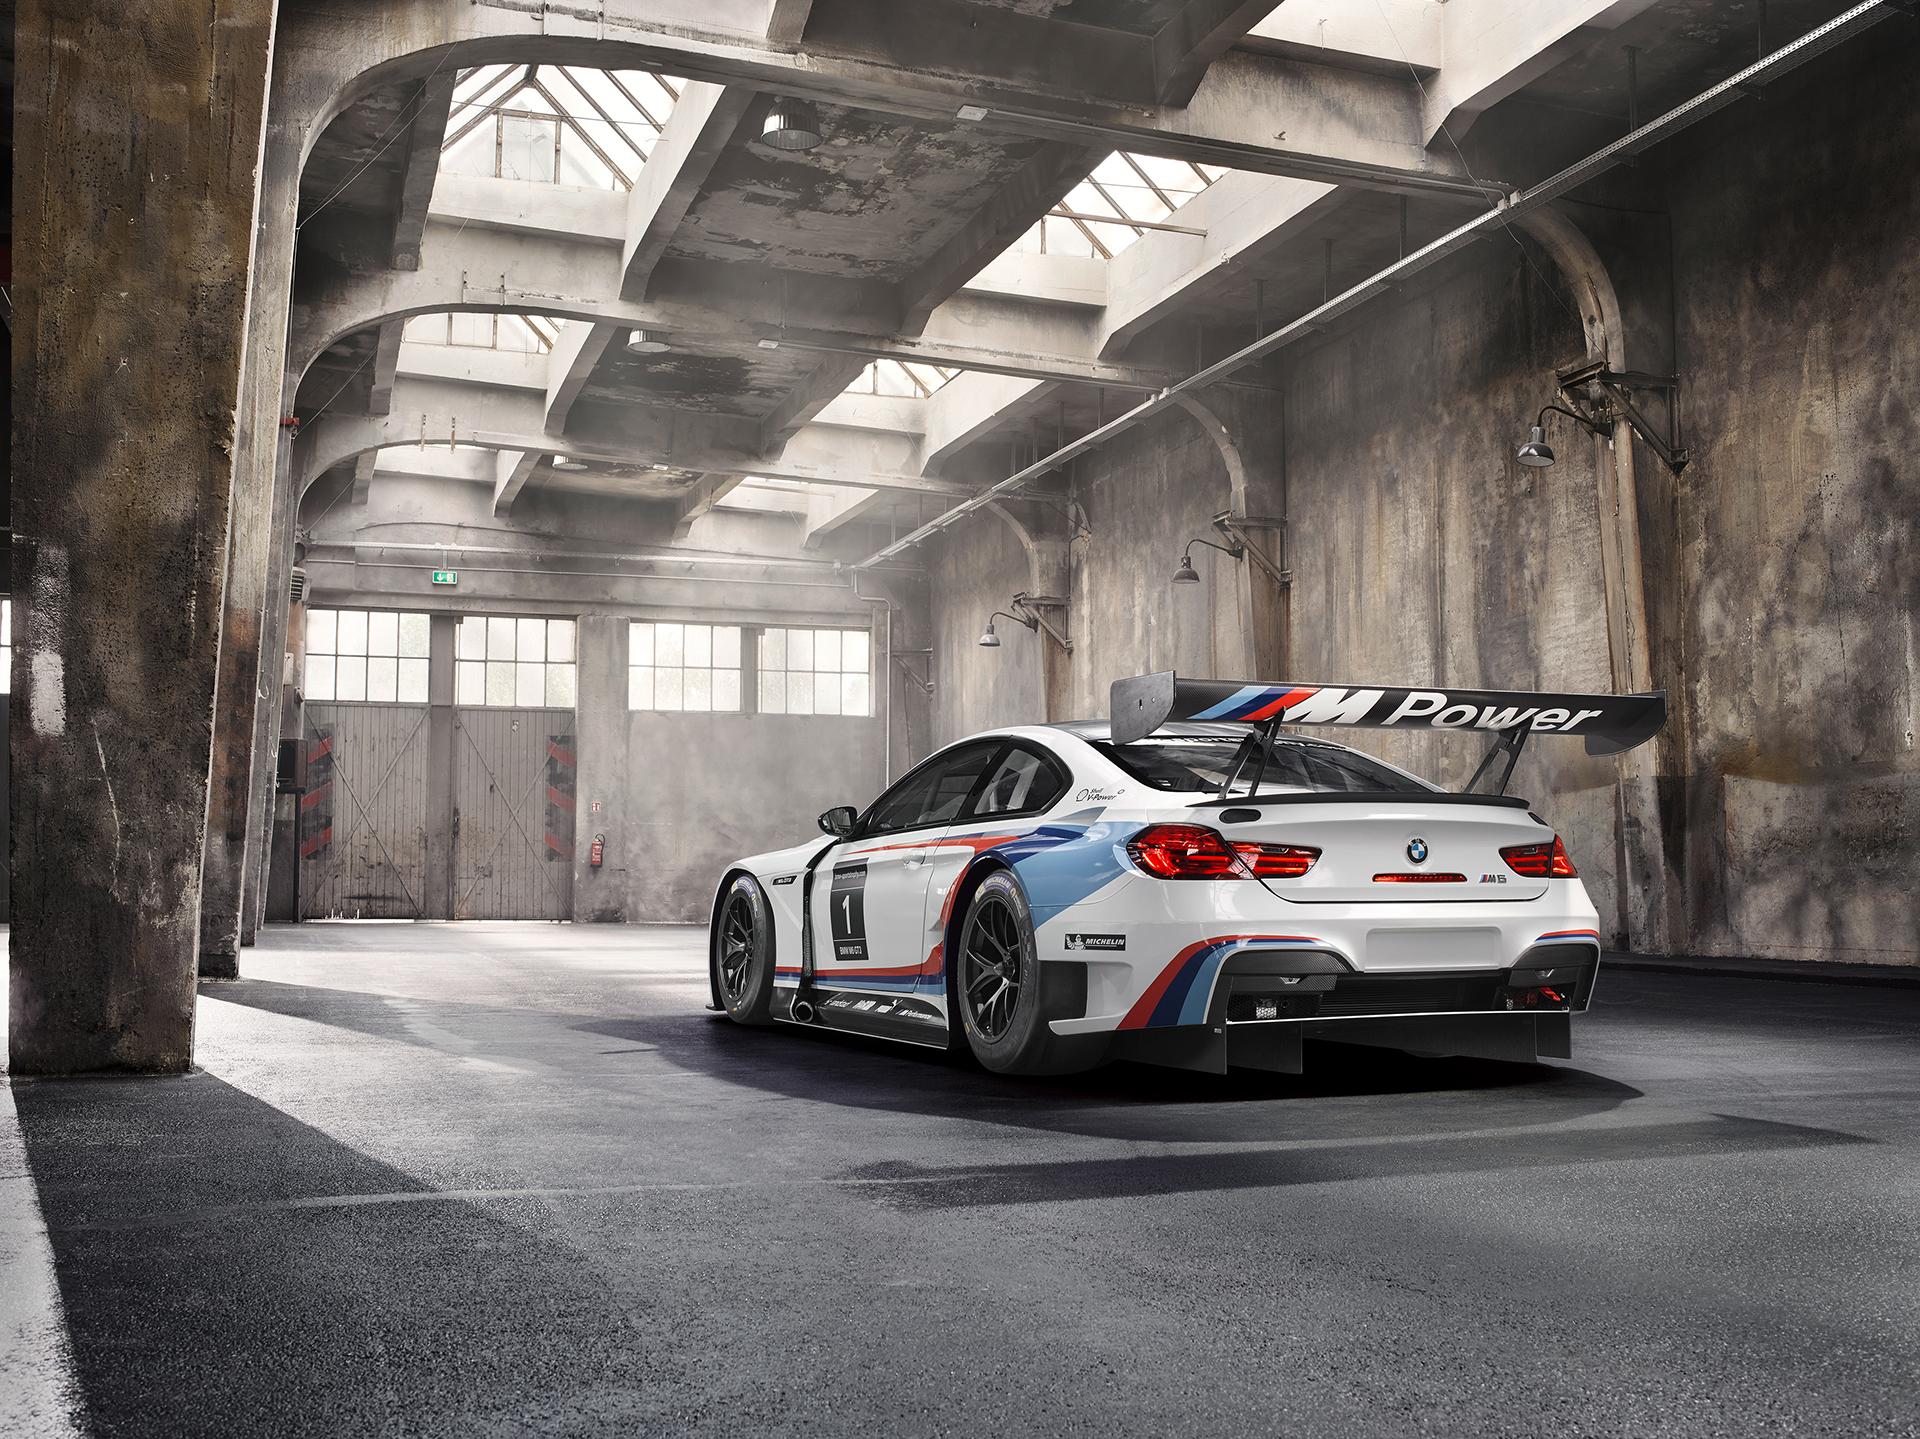 BMW M6 GT3 - 2016 - rear side-face / profil arrière